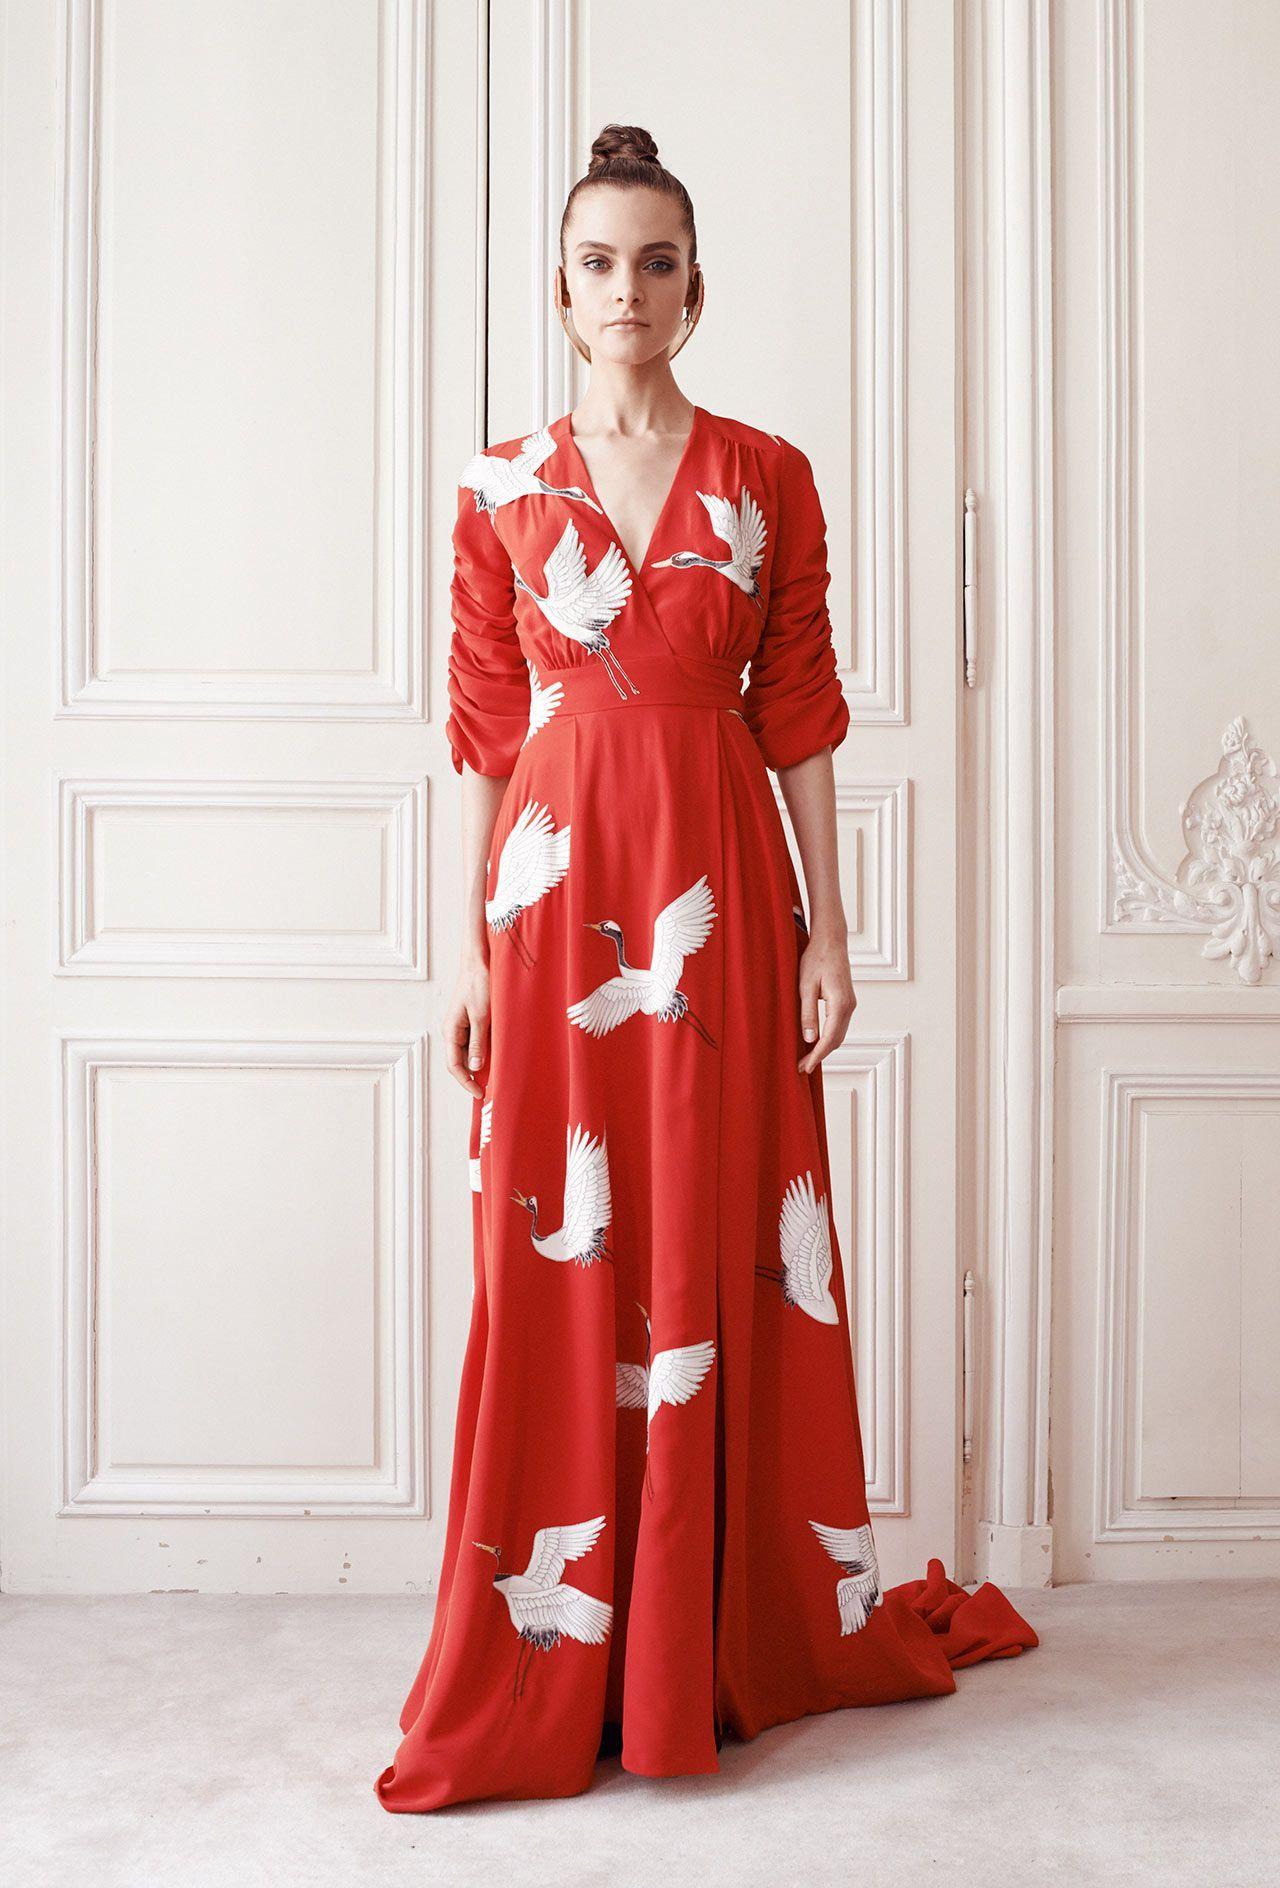 Robe longue de tattoo pictures to pin on pinterest - Robe Du Soir Longue Oiseaux Automne Hiver 14 15 Couture Campagne Delphine